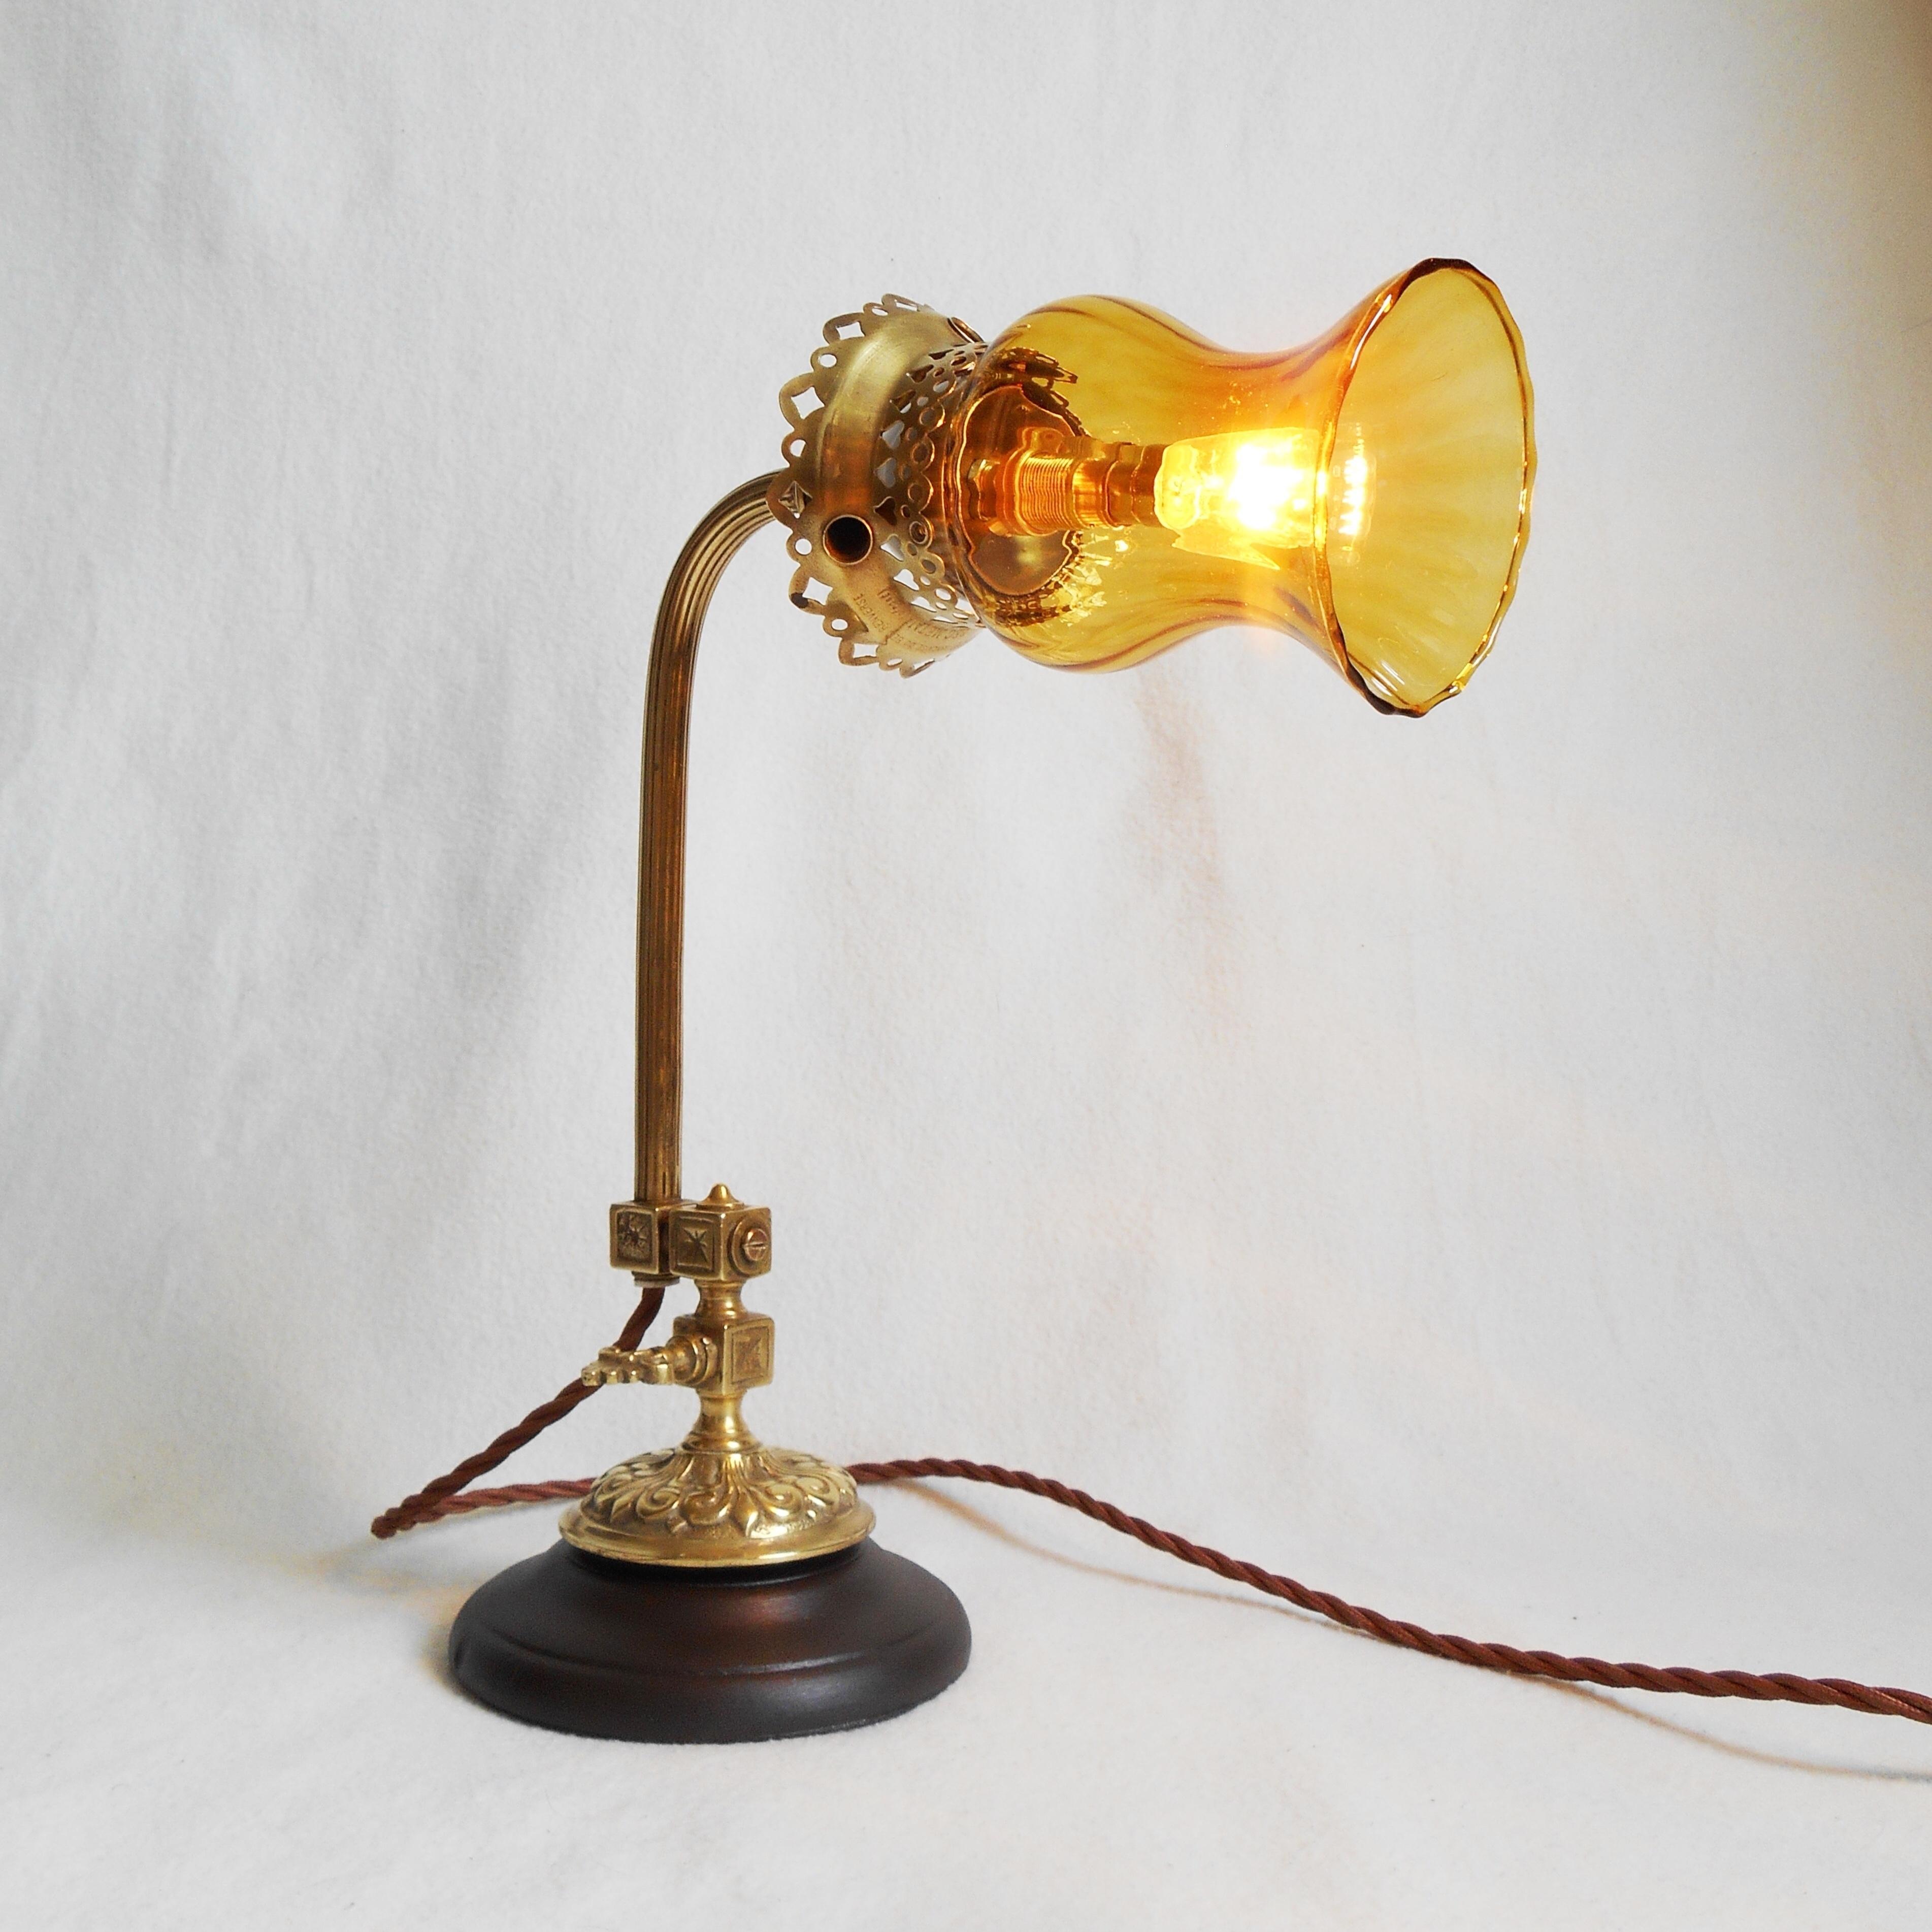 French Antique Gas Lamp Repurposed Into A Unique Table Lamp Fiona Bradshaw Designs Fiona Bradshaw Designs Vinterior